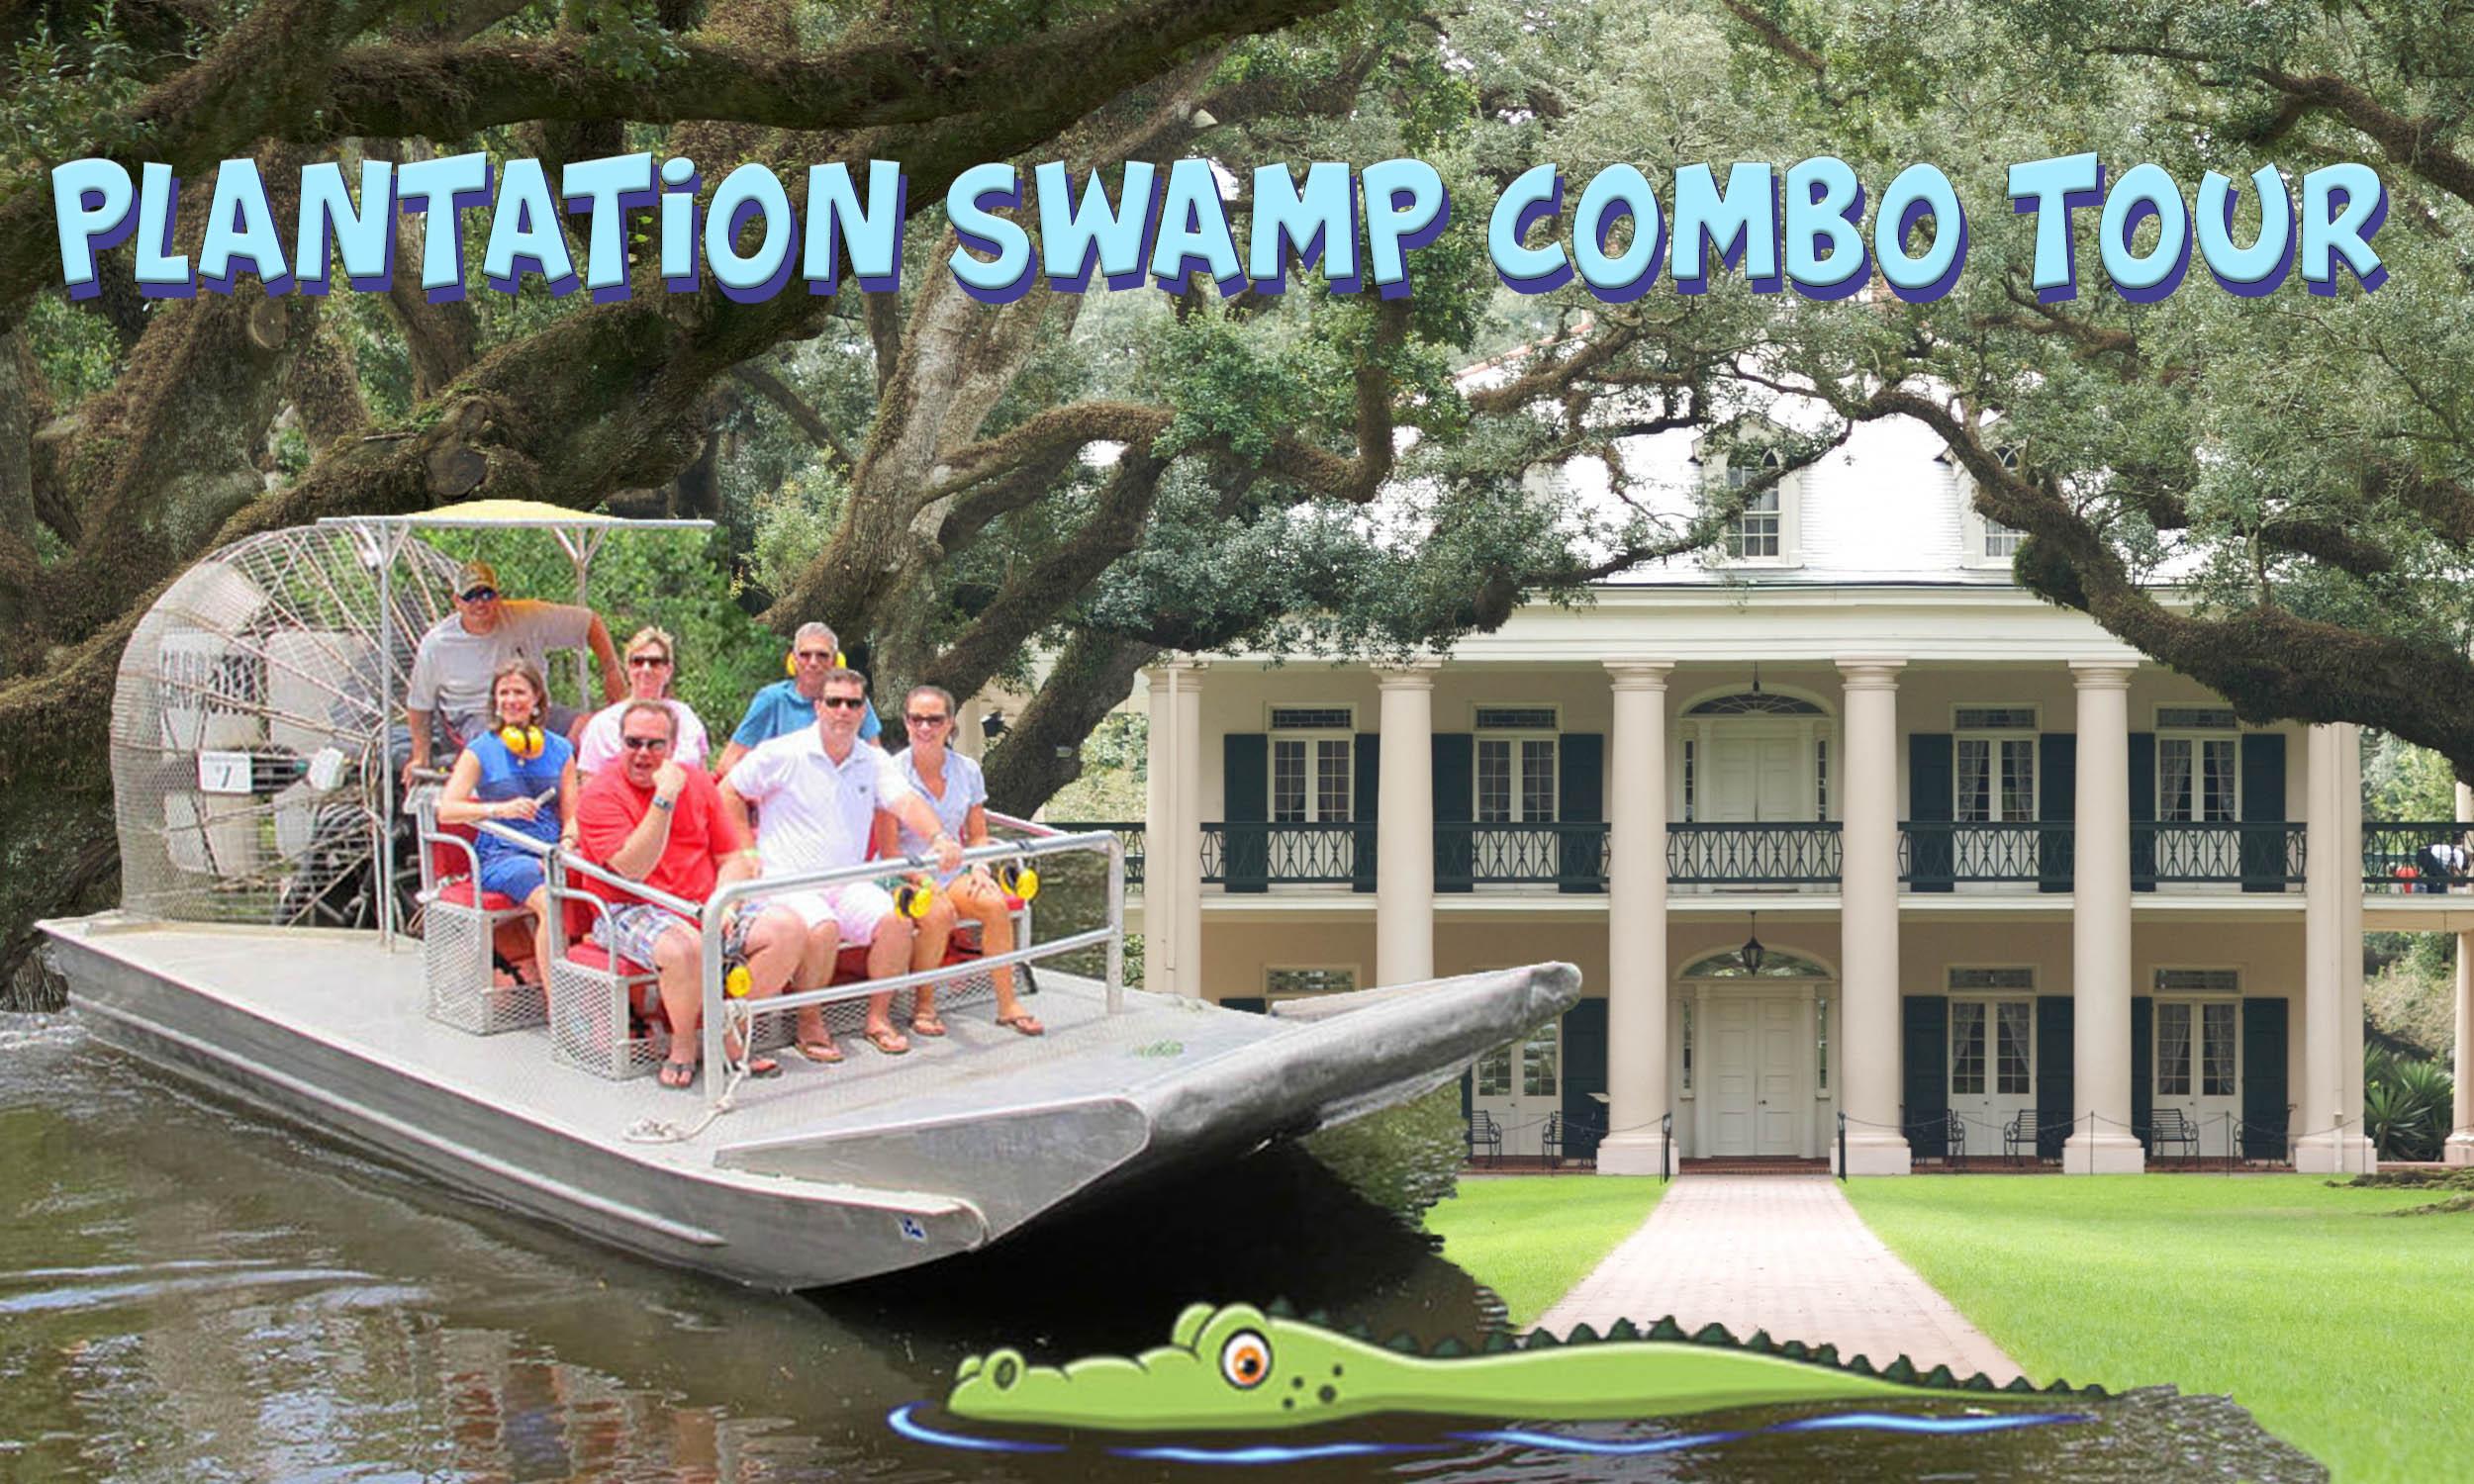 Plantation Swamp Combo Tour.jpg